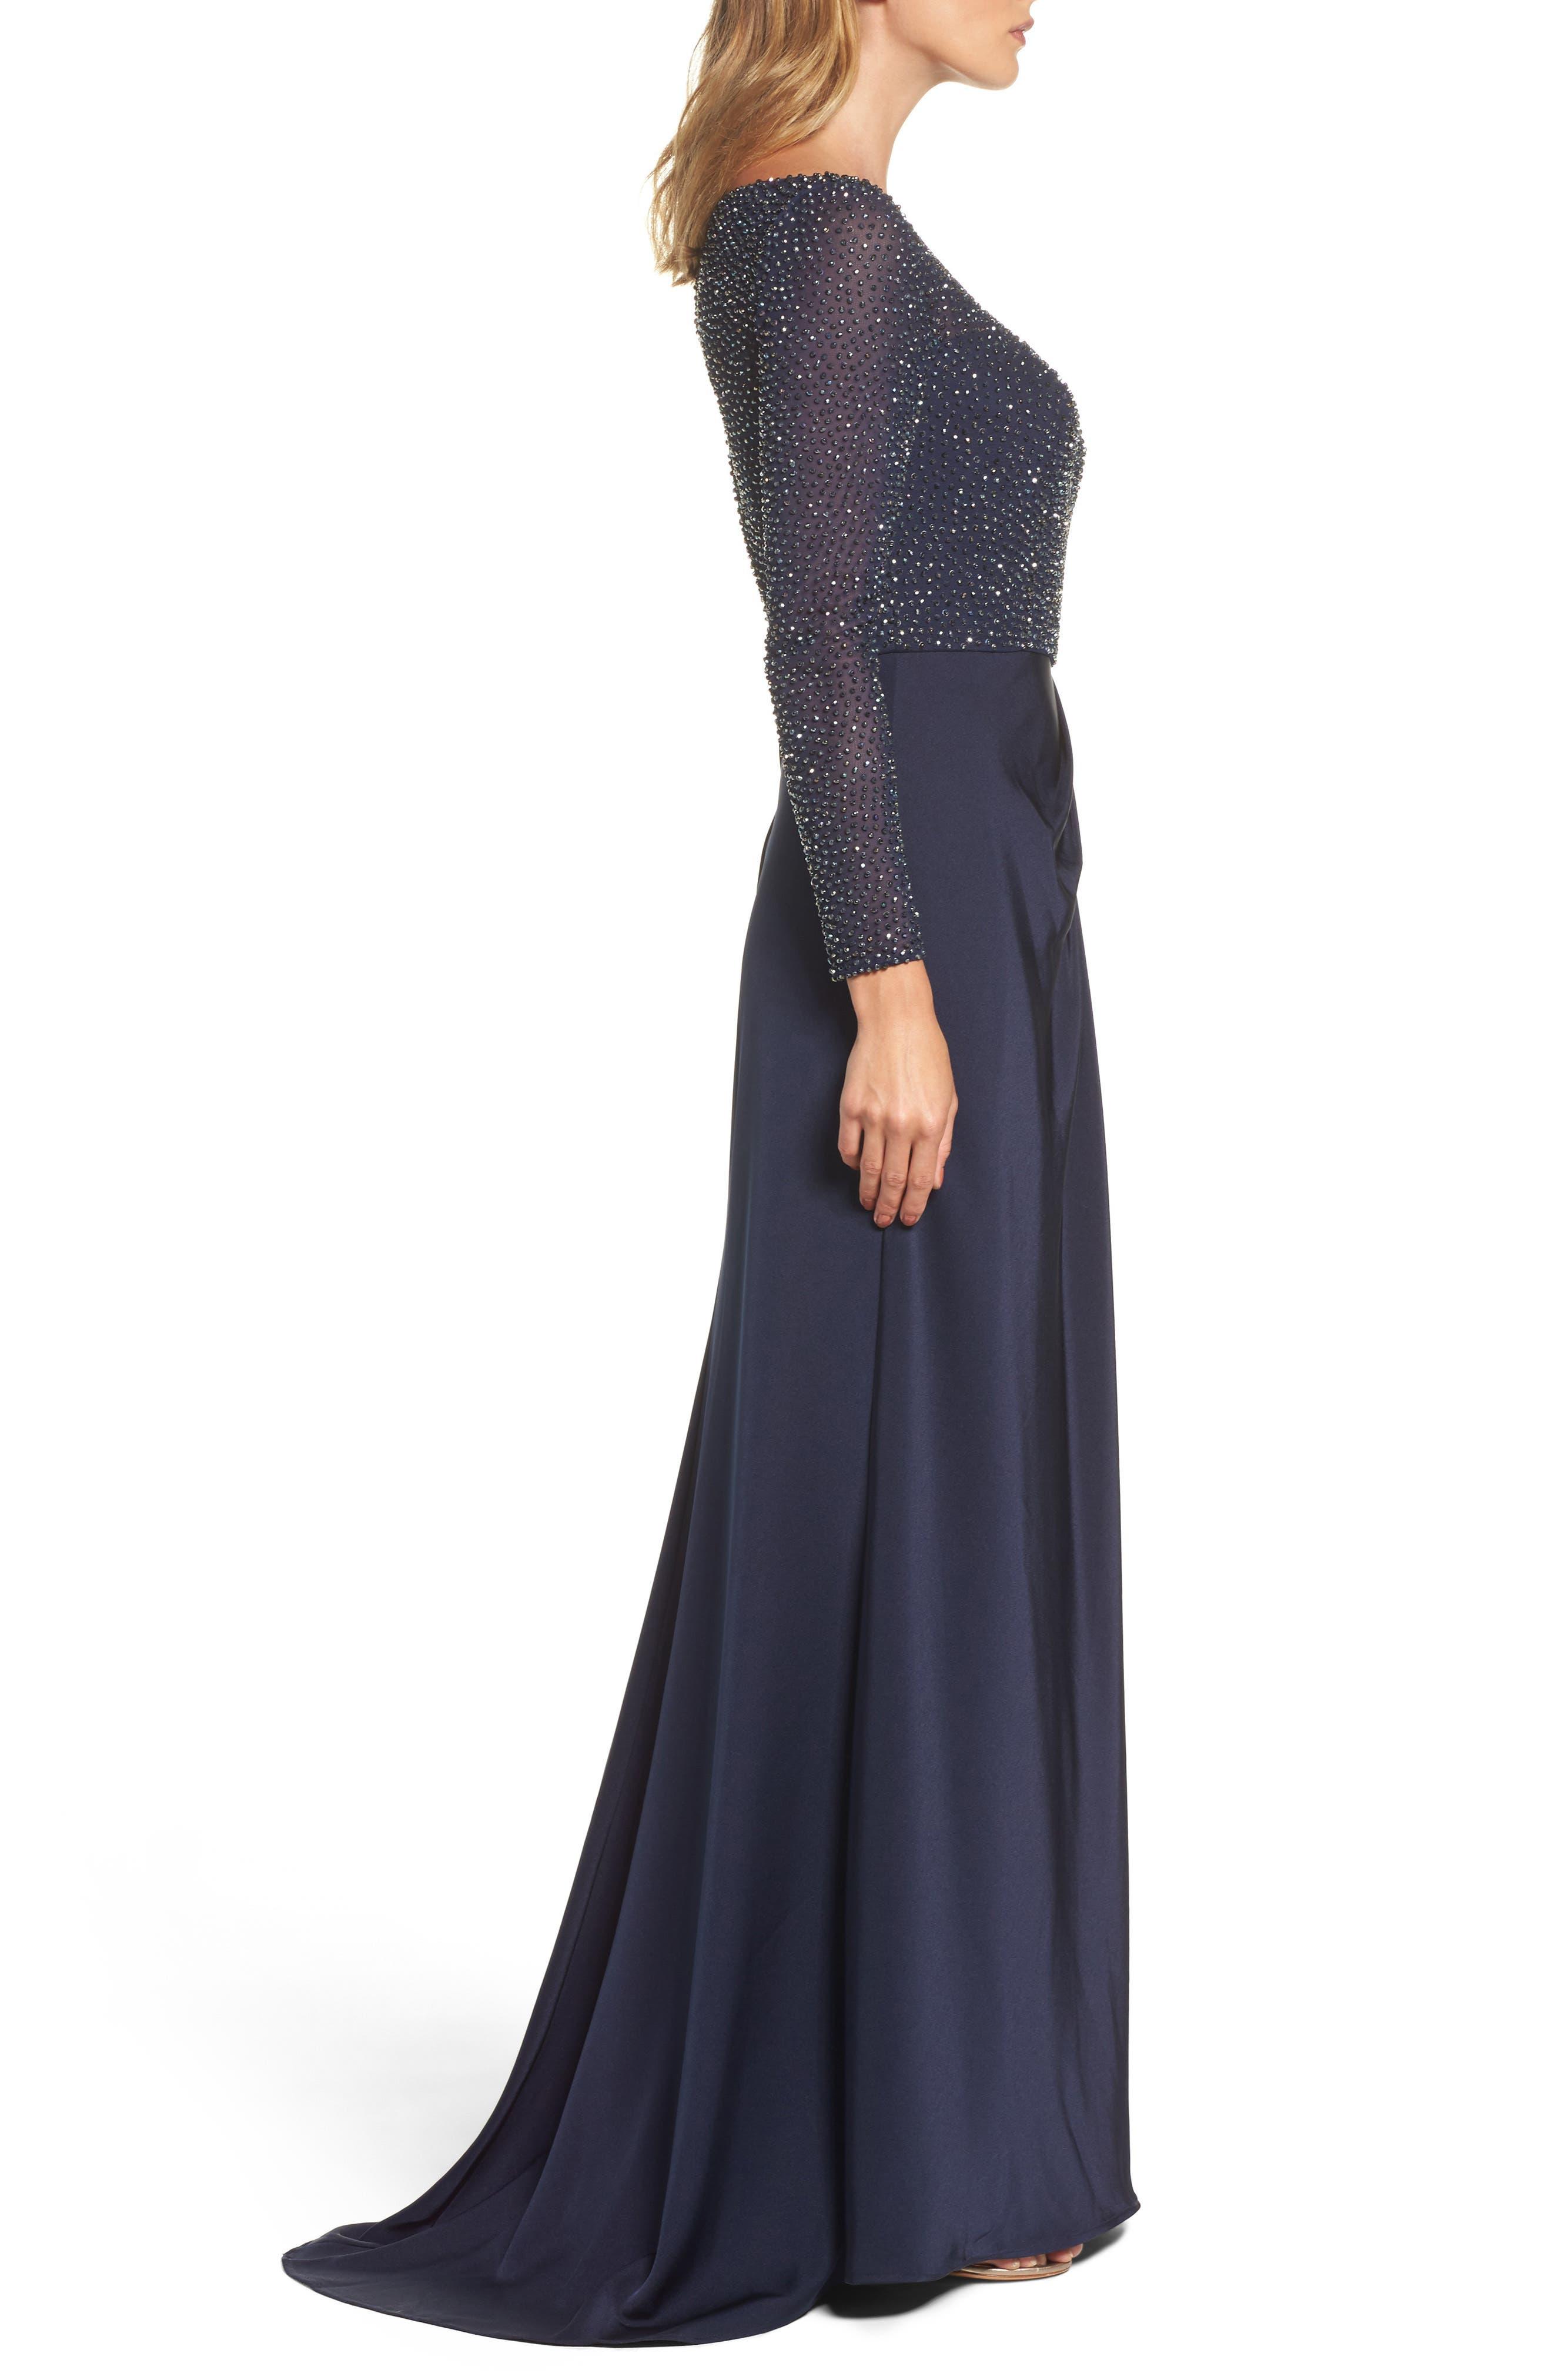 LA FEMME, Bead Embellished Gown, Alternate thumbnail 3, color, NAVY